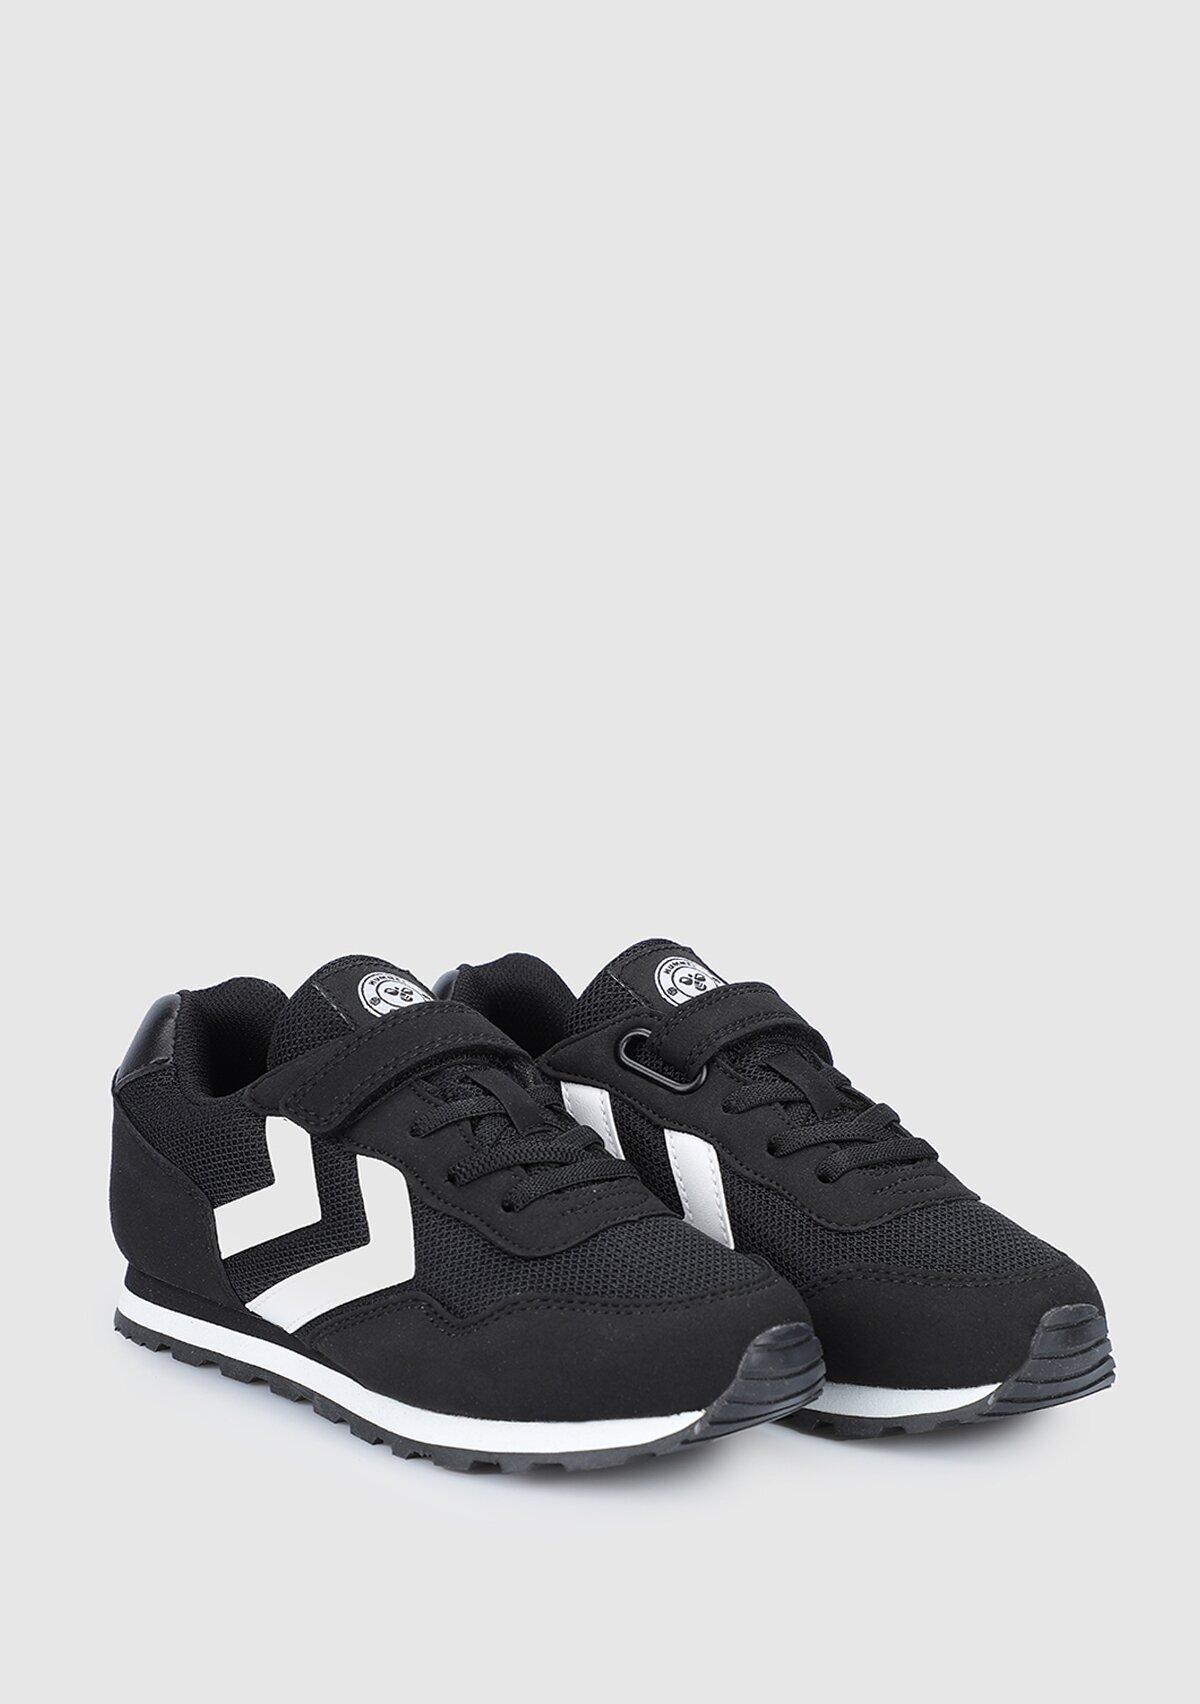 resm Hmlthor Jr Sneaker Siyah Çocuk Sneaker 212678-2114